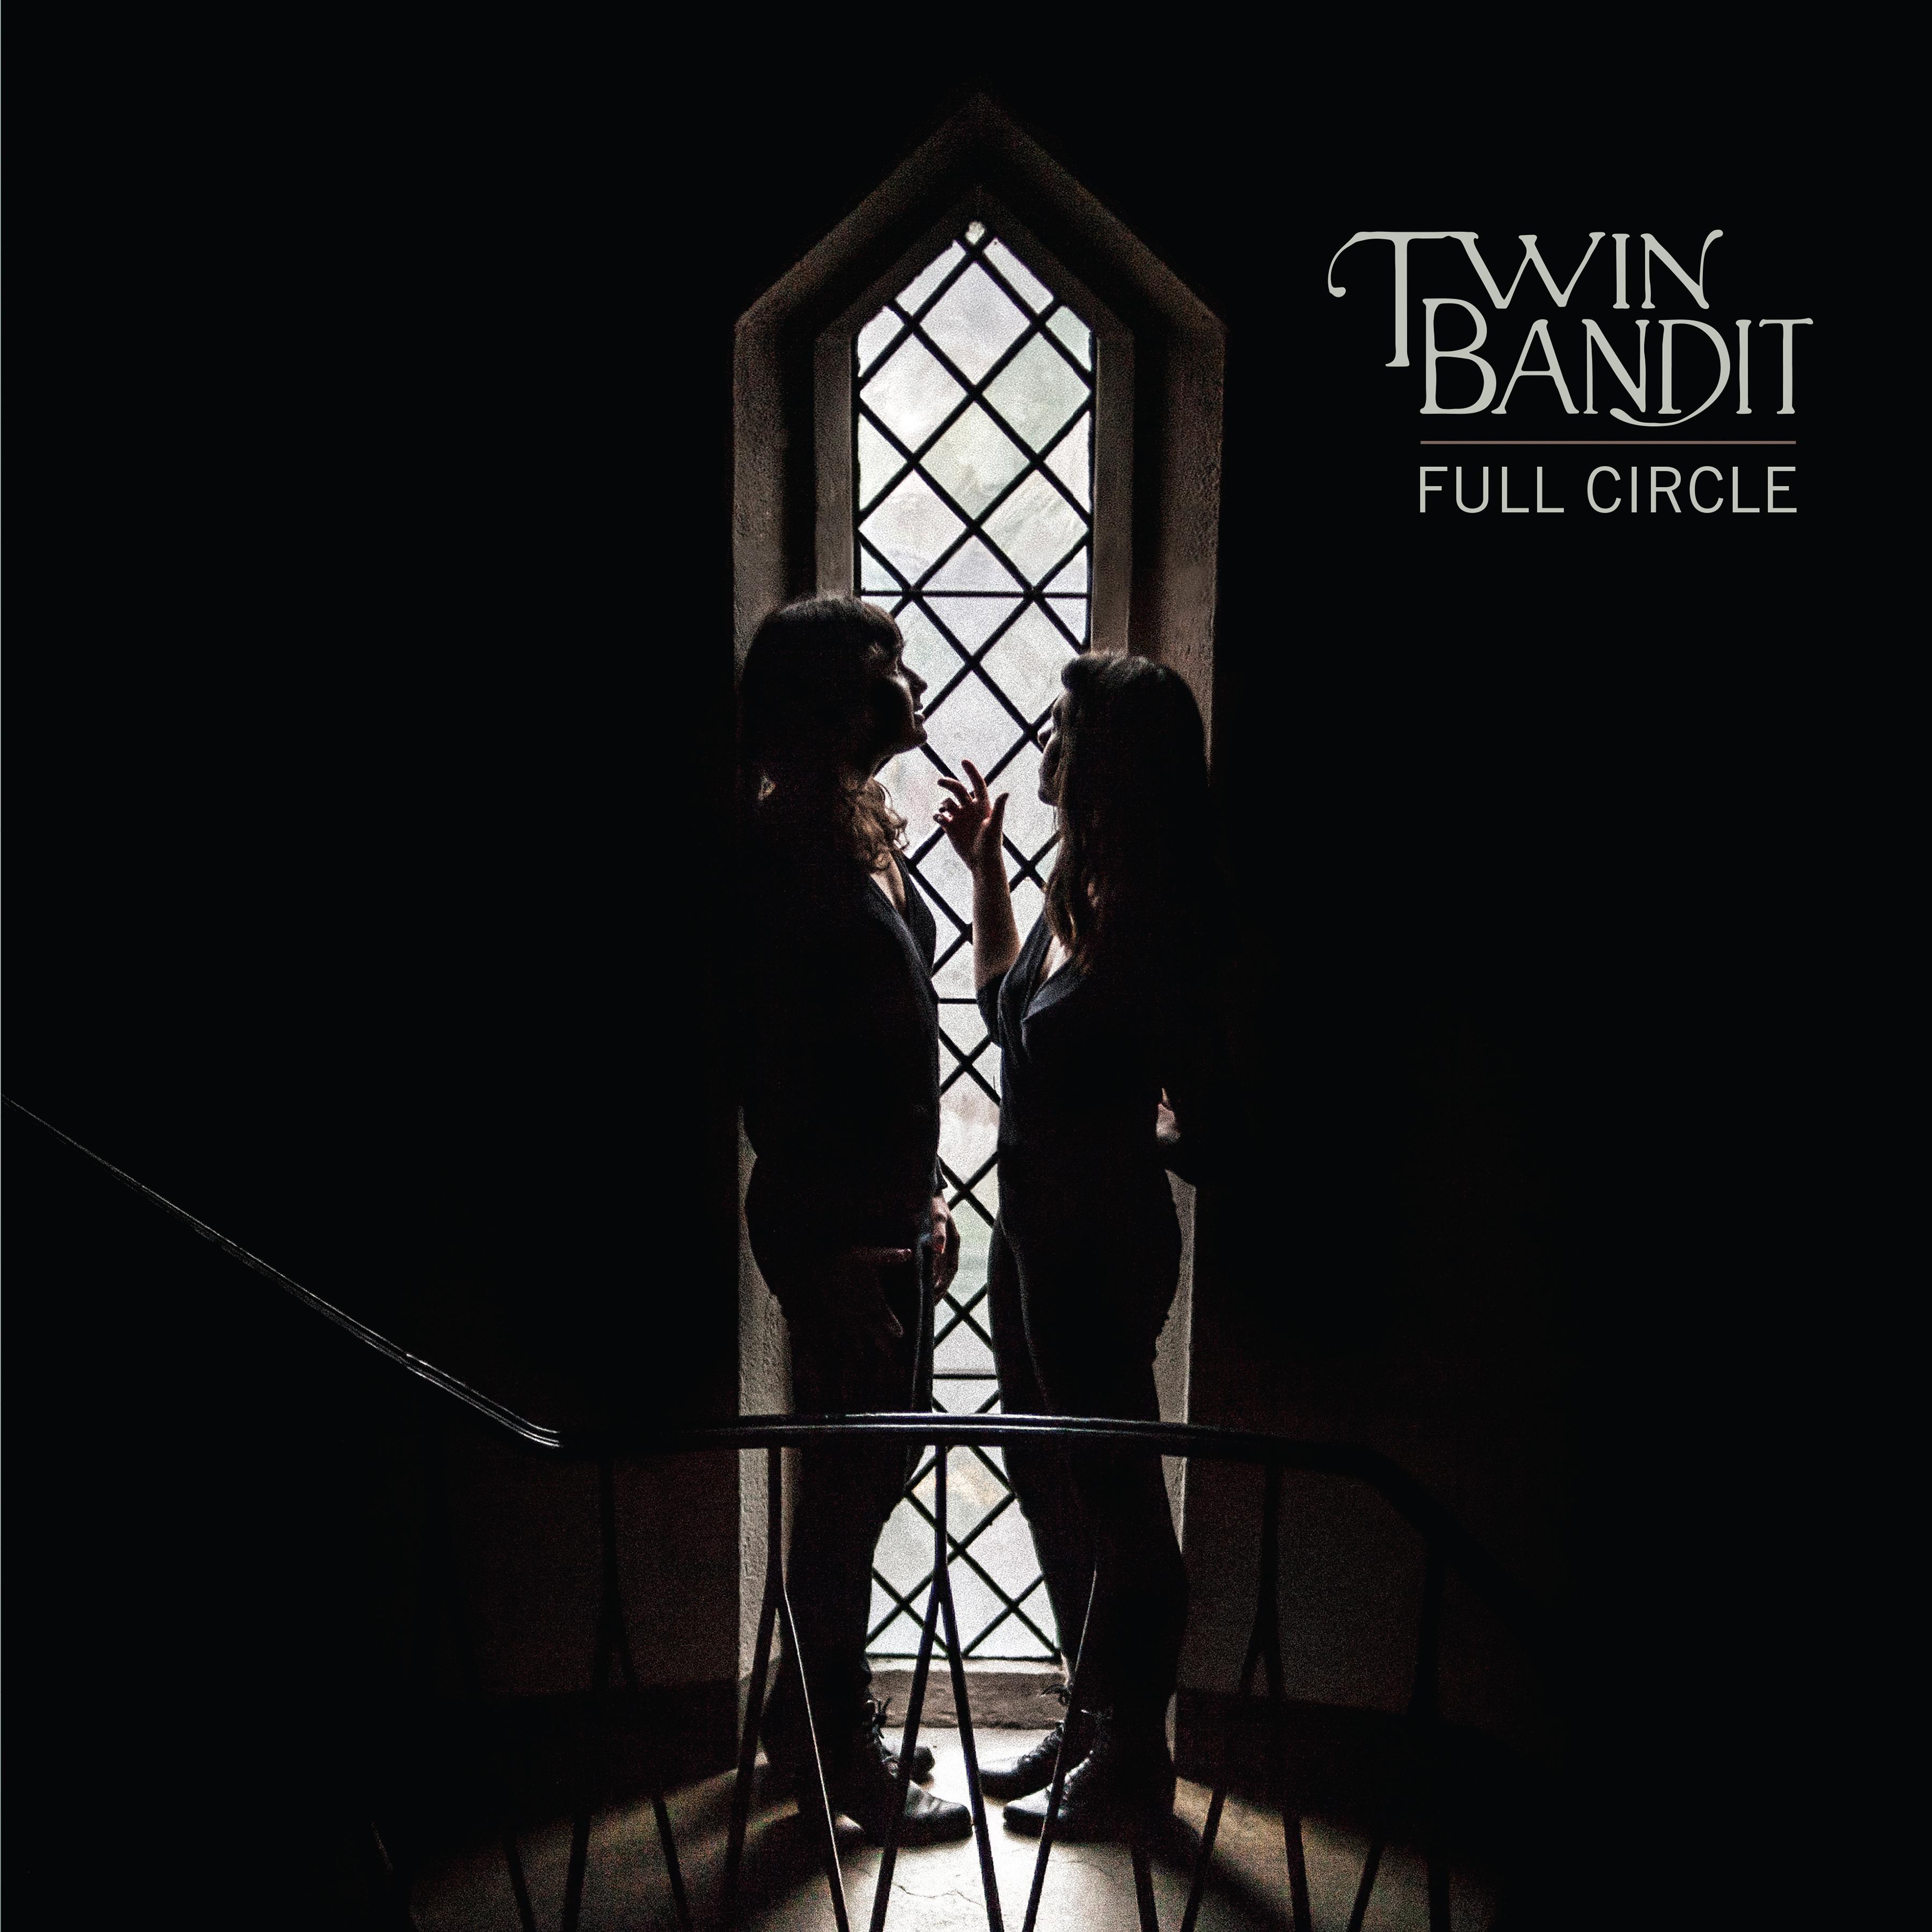 Twin Bandit stream new album 'Full Circle'